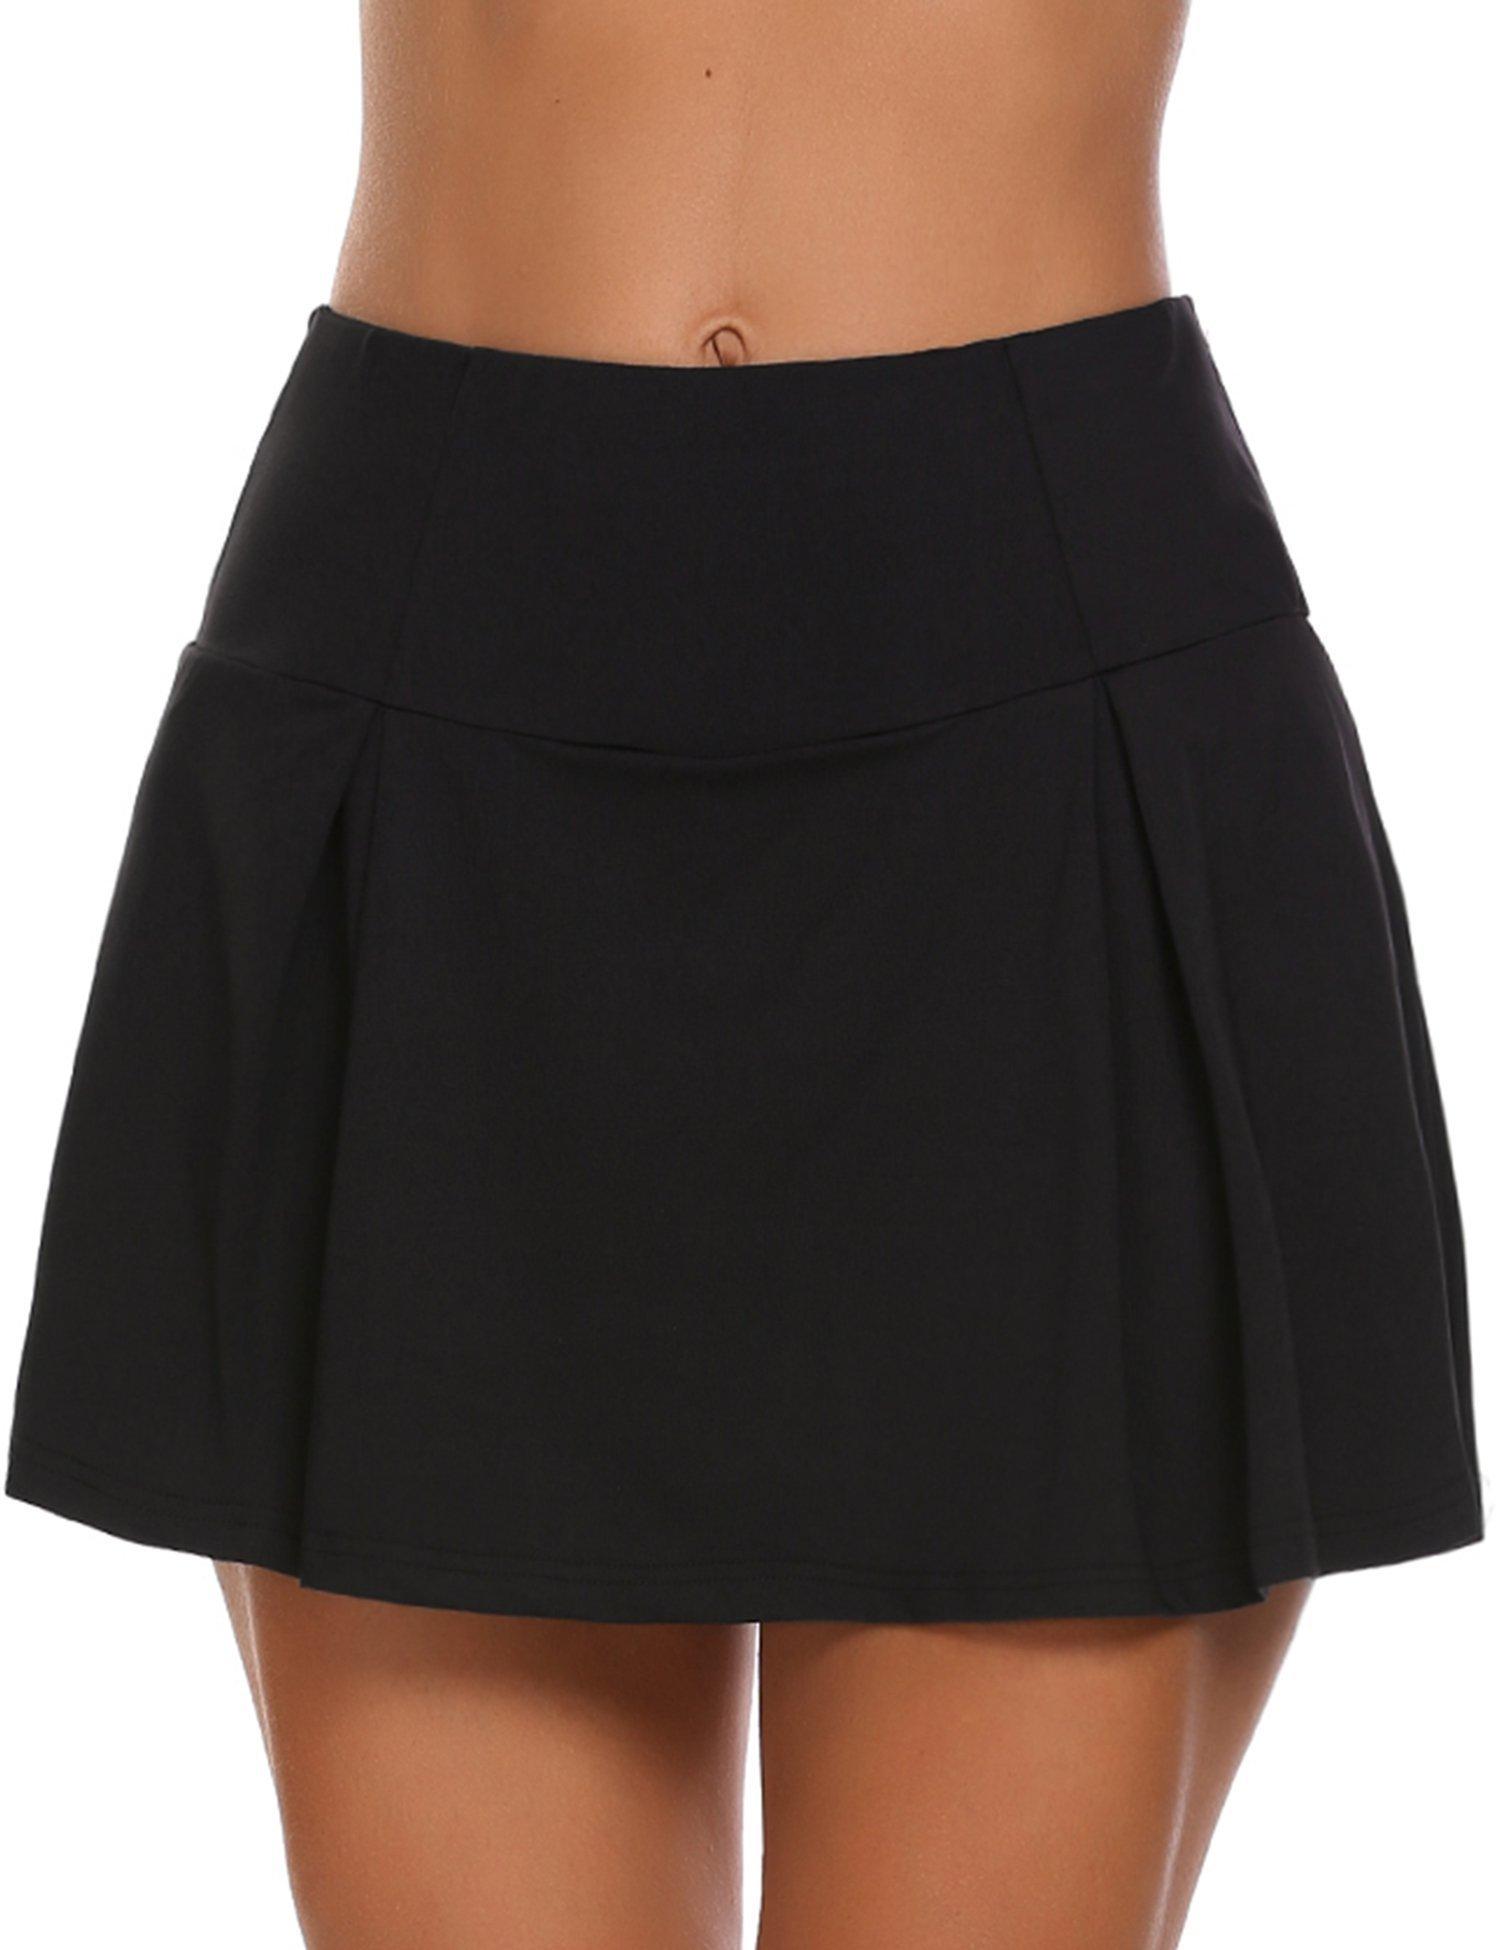 granate Women's Basic Casual Sports Skorts Gym Tennis Skirt Shorts